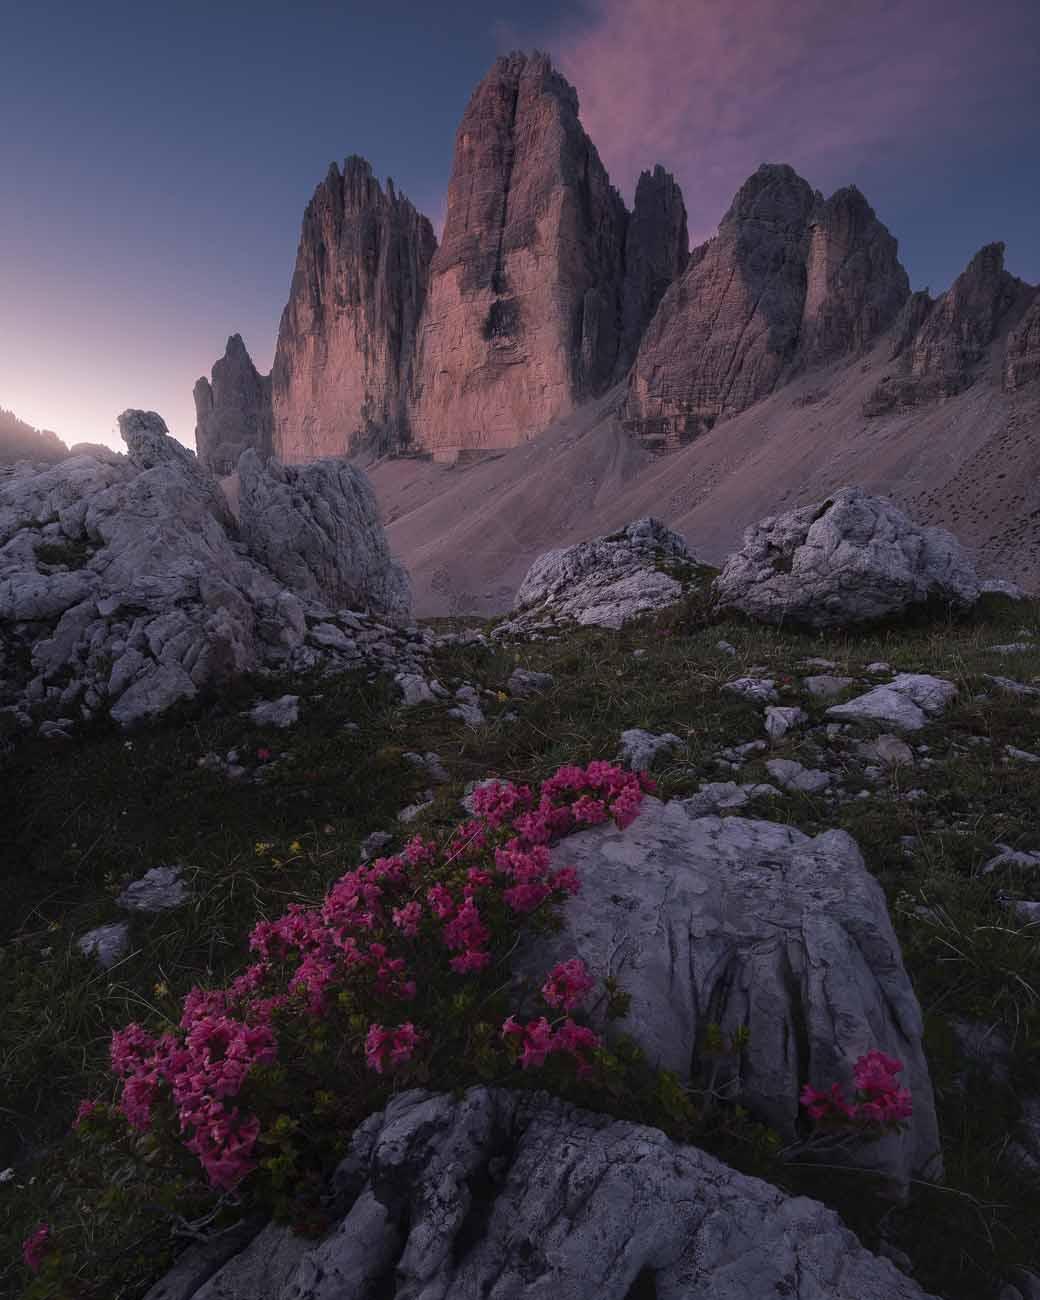 Summer in Dolomites | 7 Day Photo Workshop - day 6